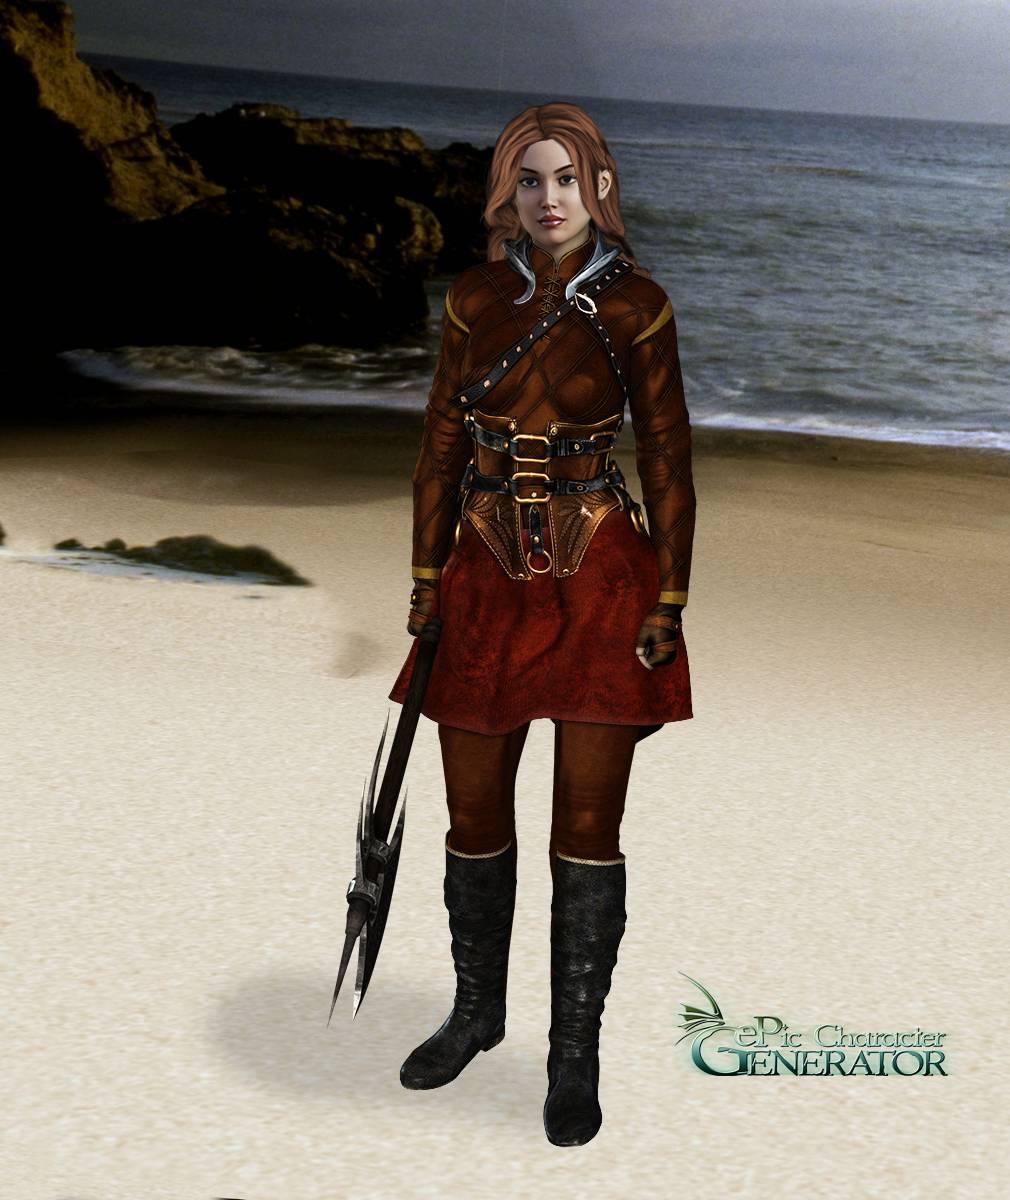 ePic Character Generator Season 2 Female Warrior Screenshot 05